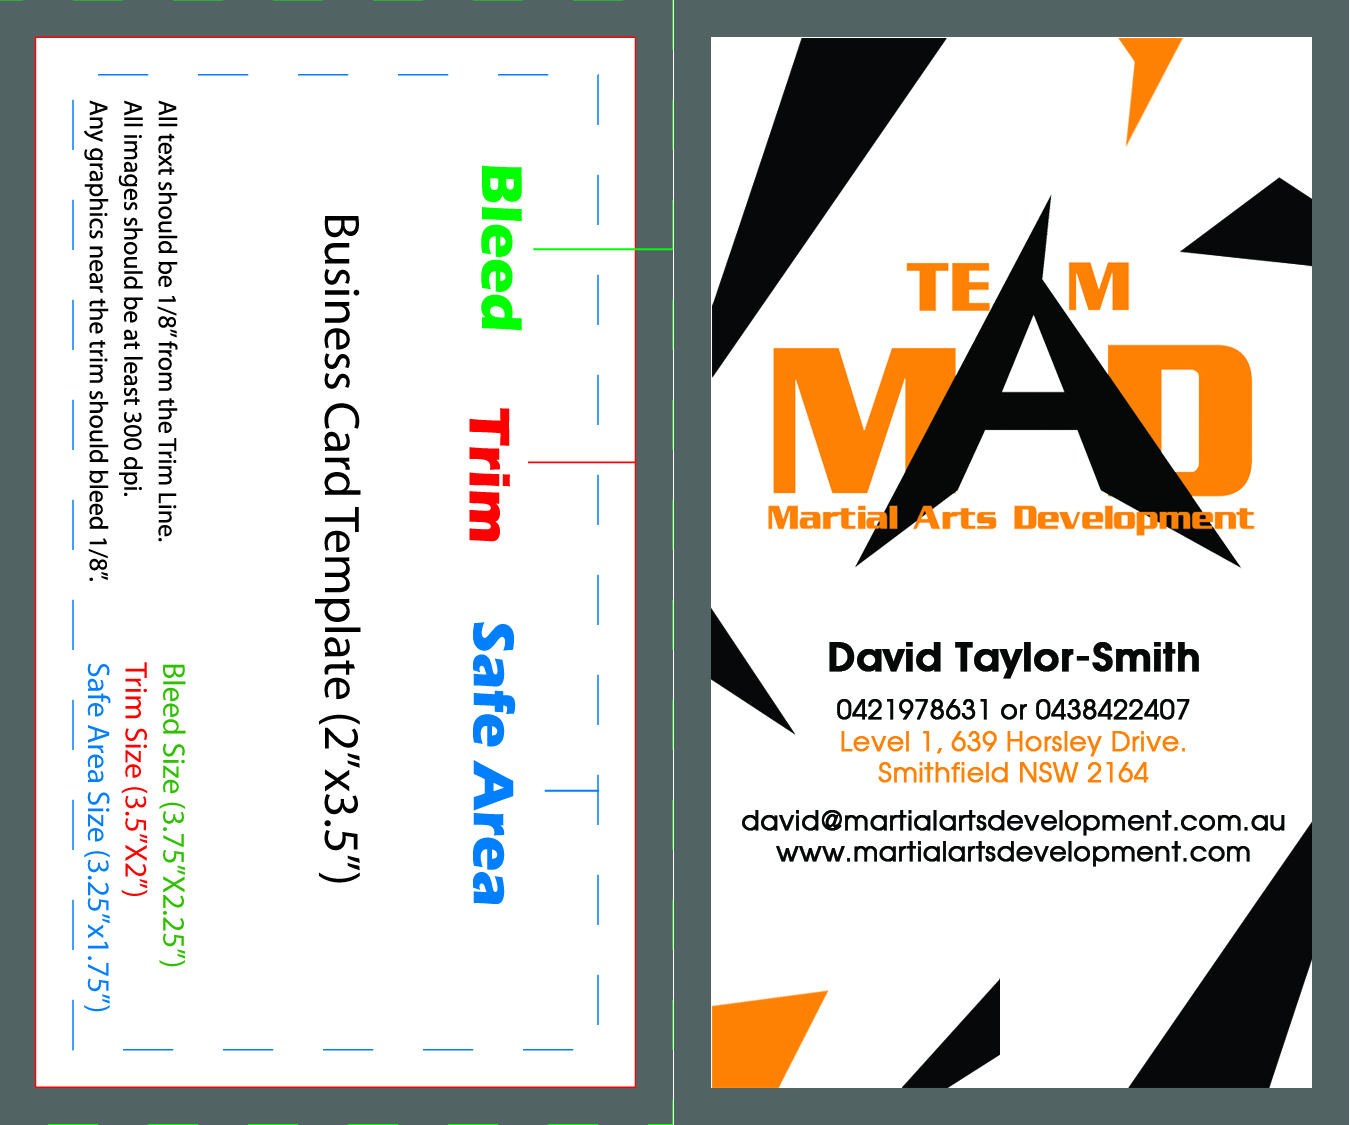 Bold serious training business card design for martial arts business card design by wiki designer for martial arts development design 3371987 colourmoves